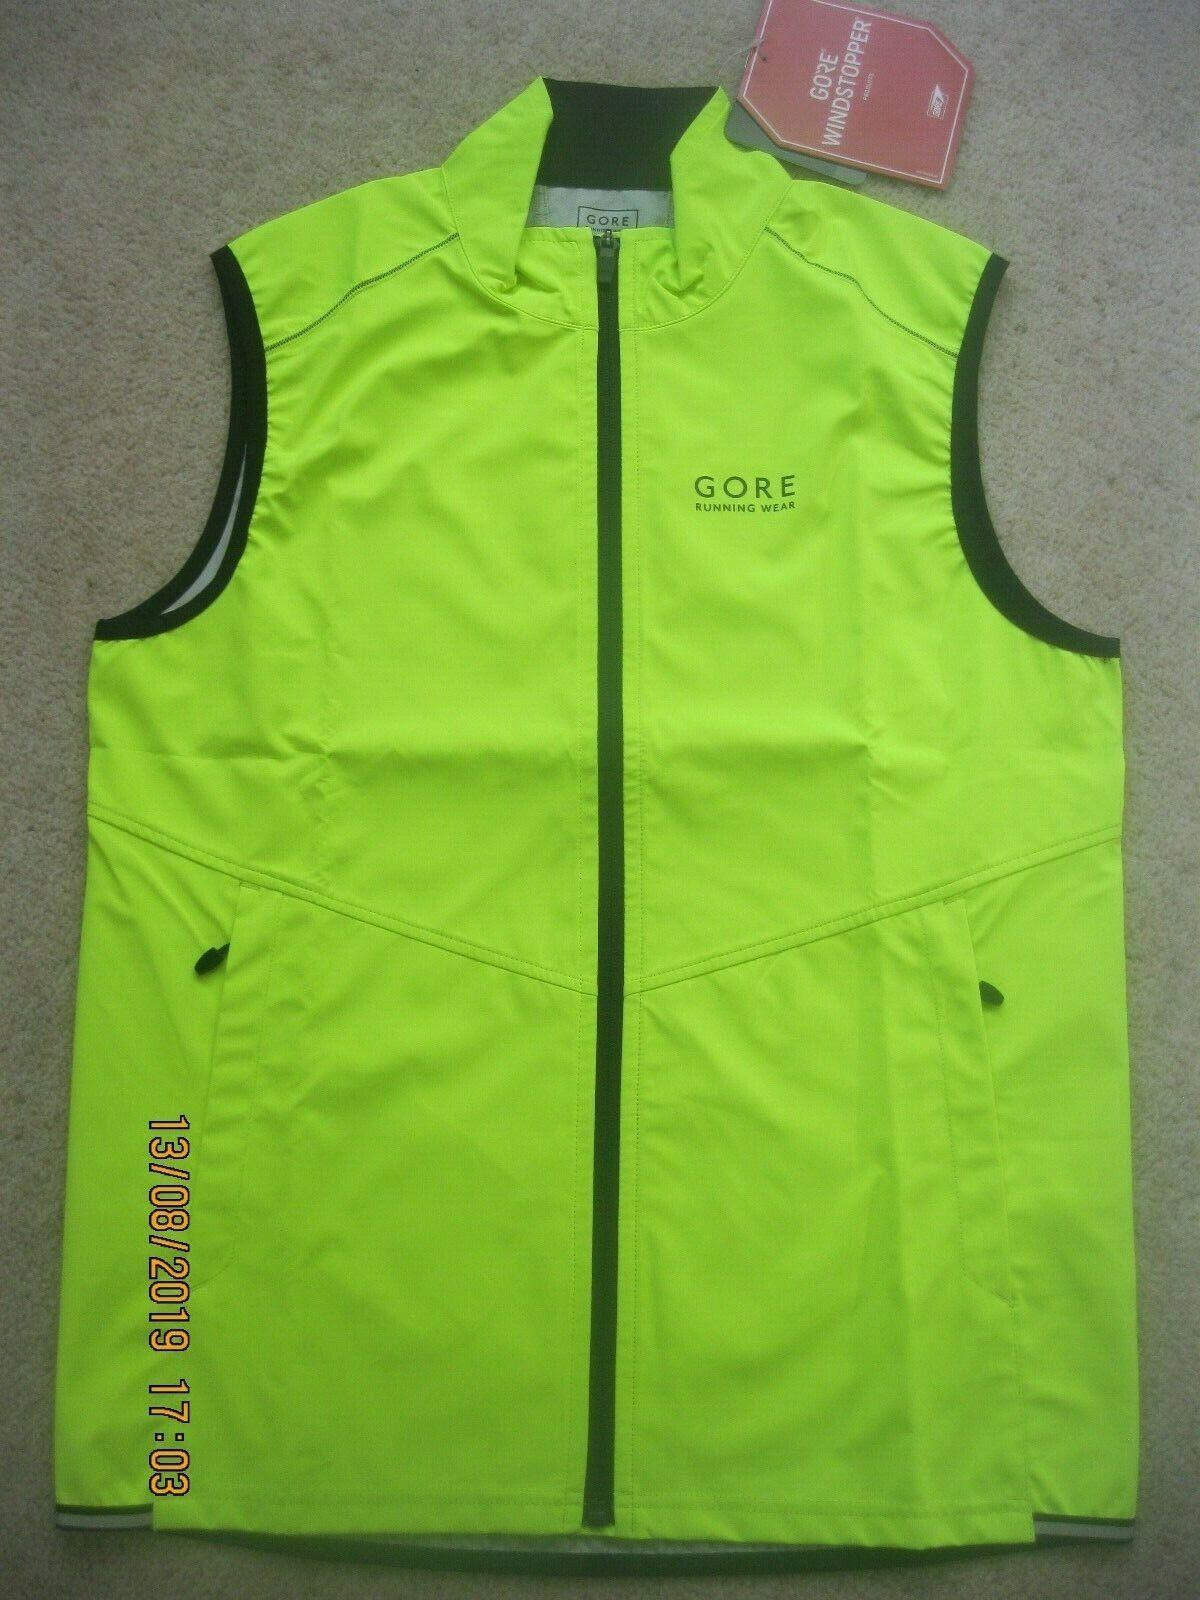 Gore Wear Mens Windstopper Running Vest in various Größes - Originally